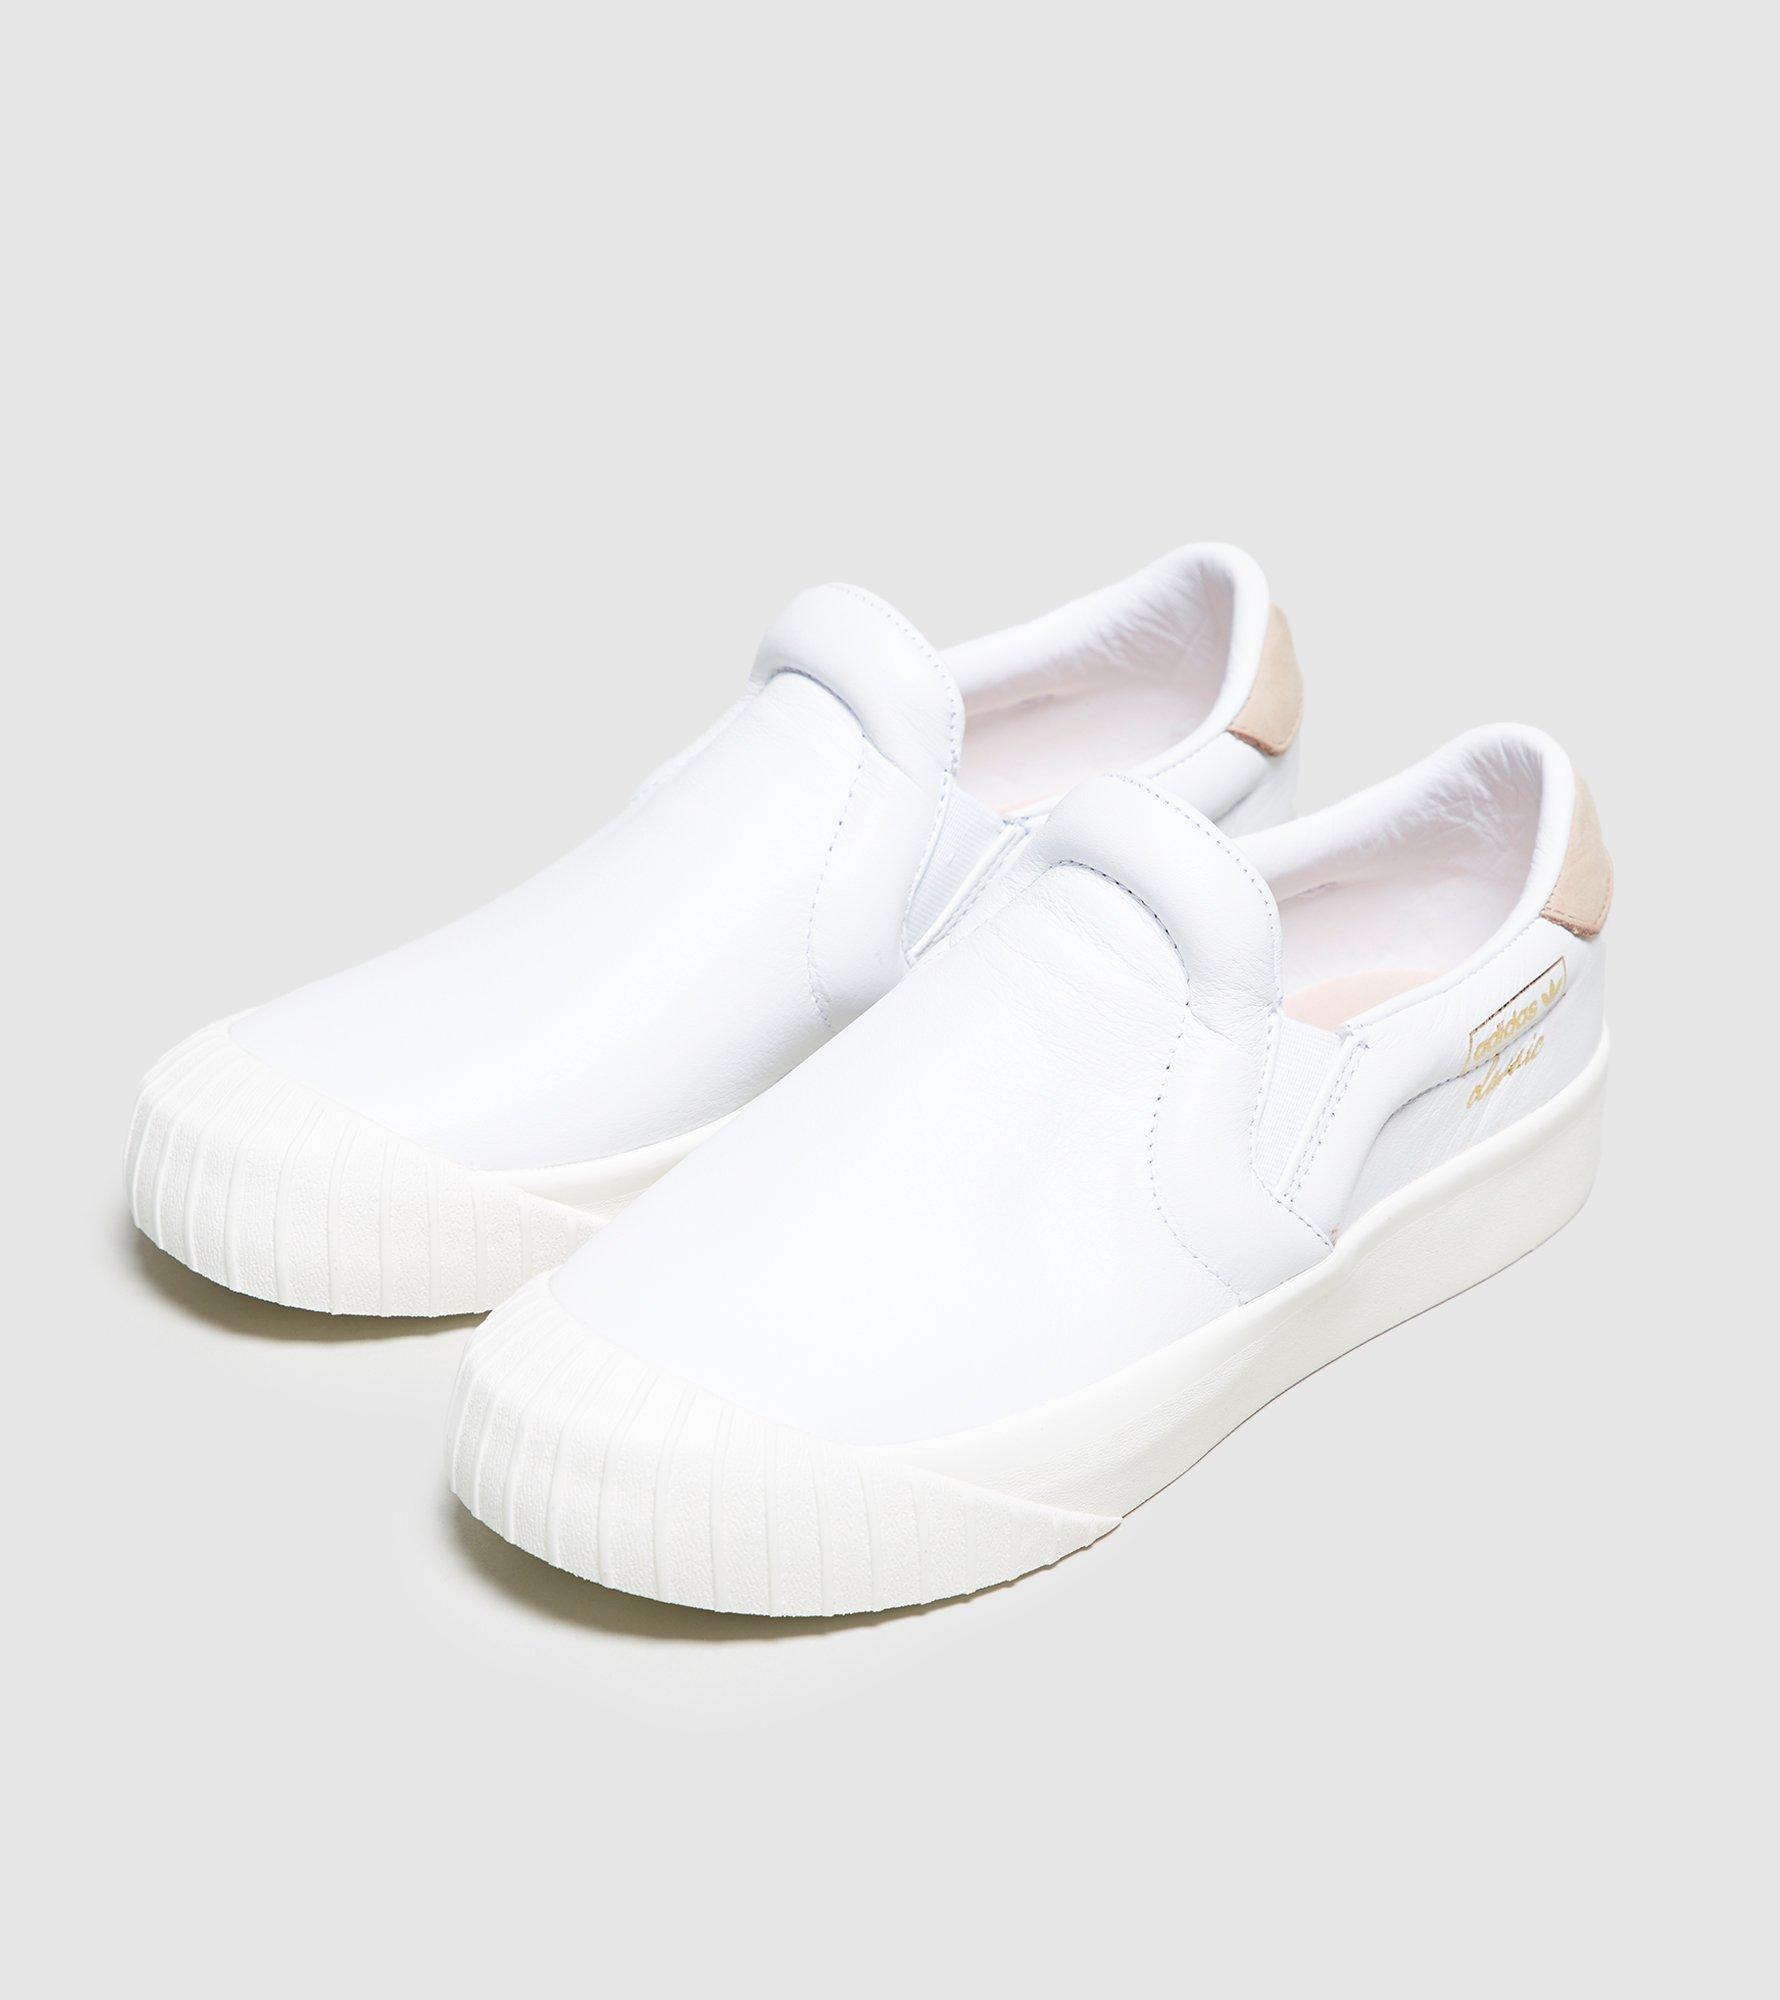 wholesale dealer 9990a 4f10d Lyst - adidas Originals Everyn Slip-on Womens in White